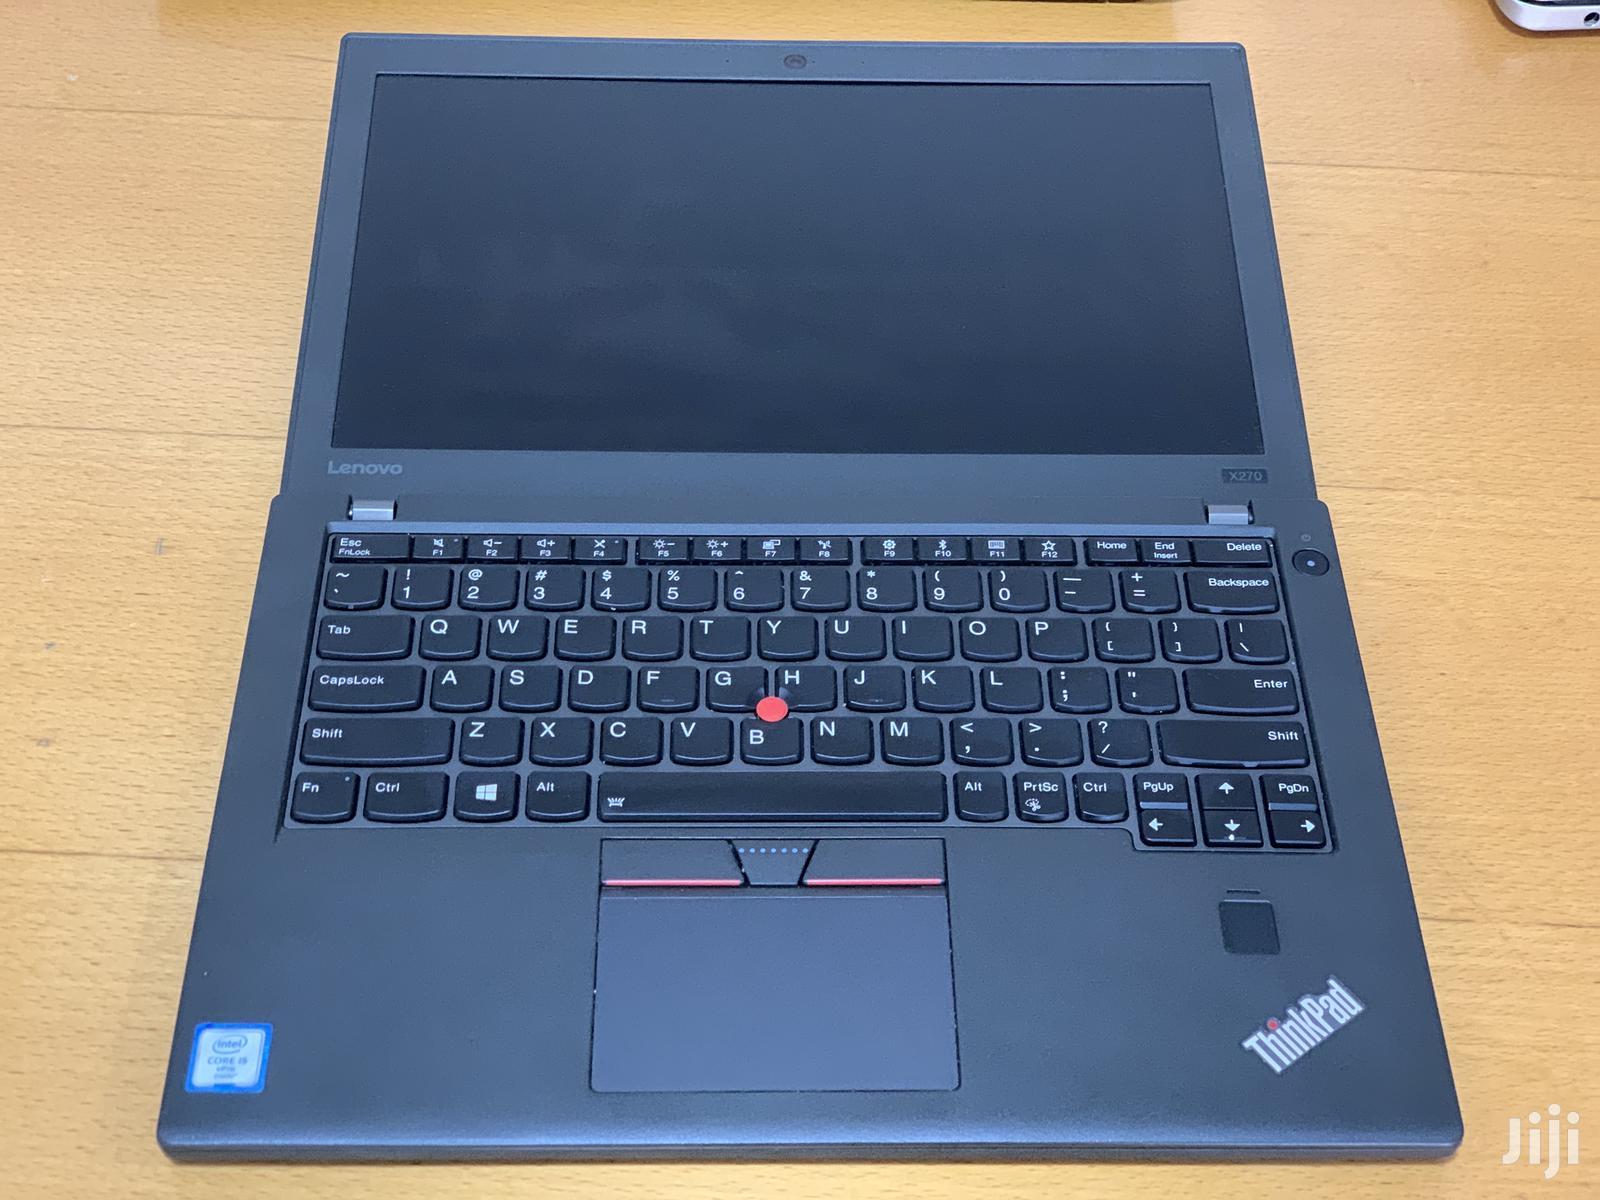 Archive: Laptop Lenovo ThinkPad X270 8GB Intel Core I5 SSD 256GB